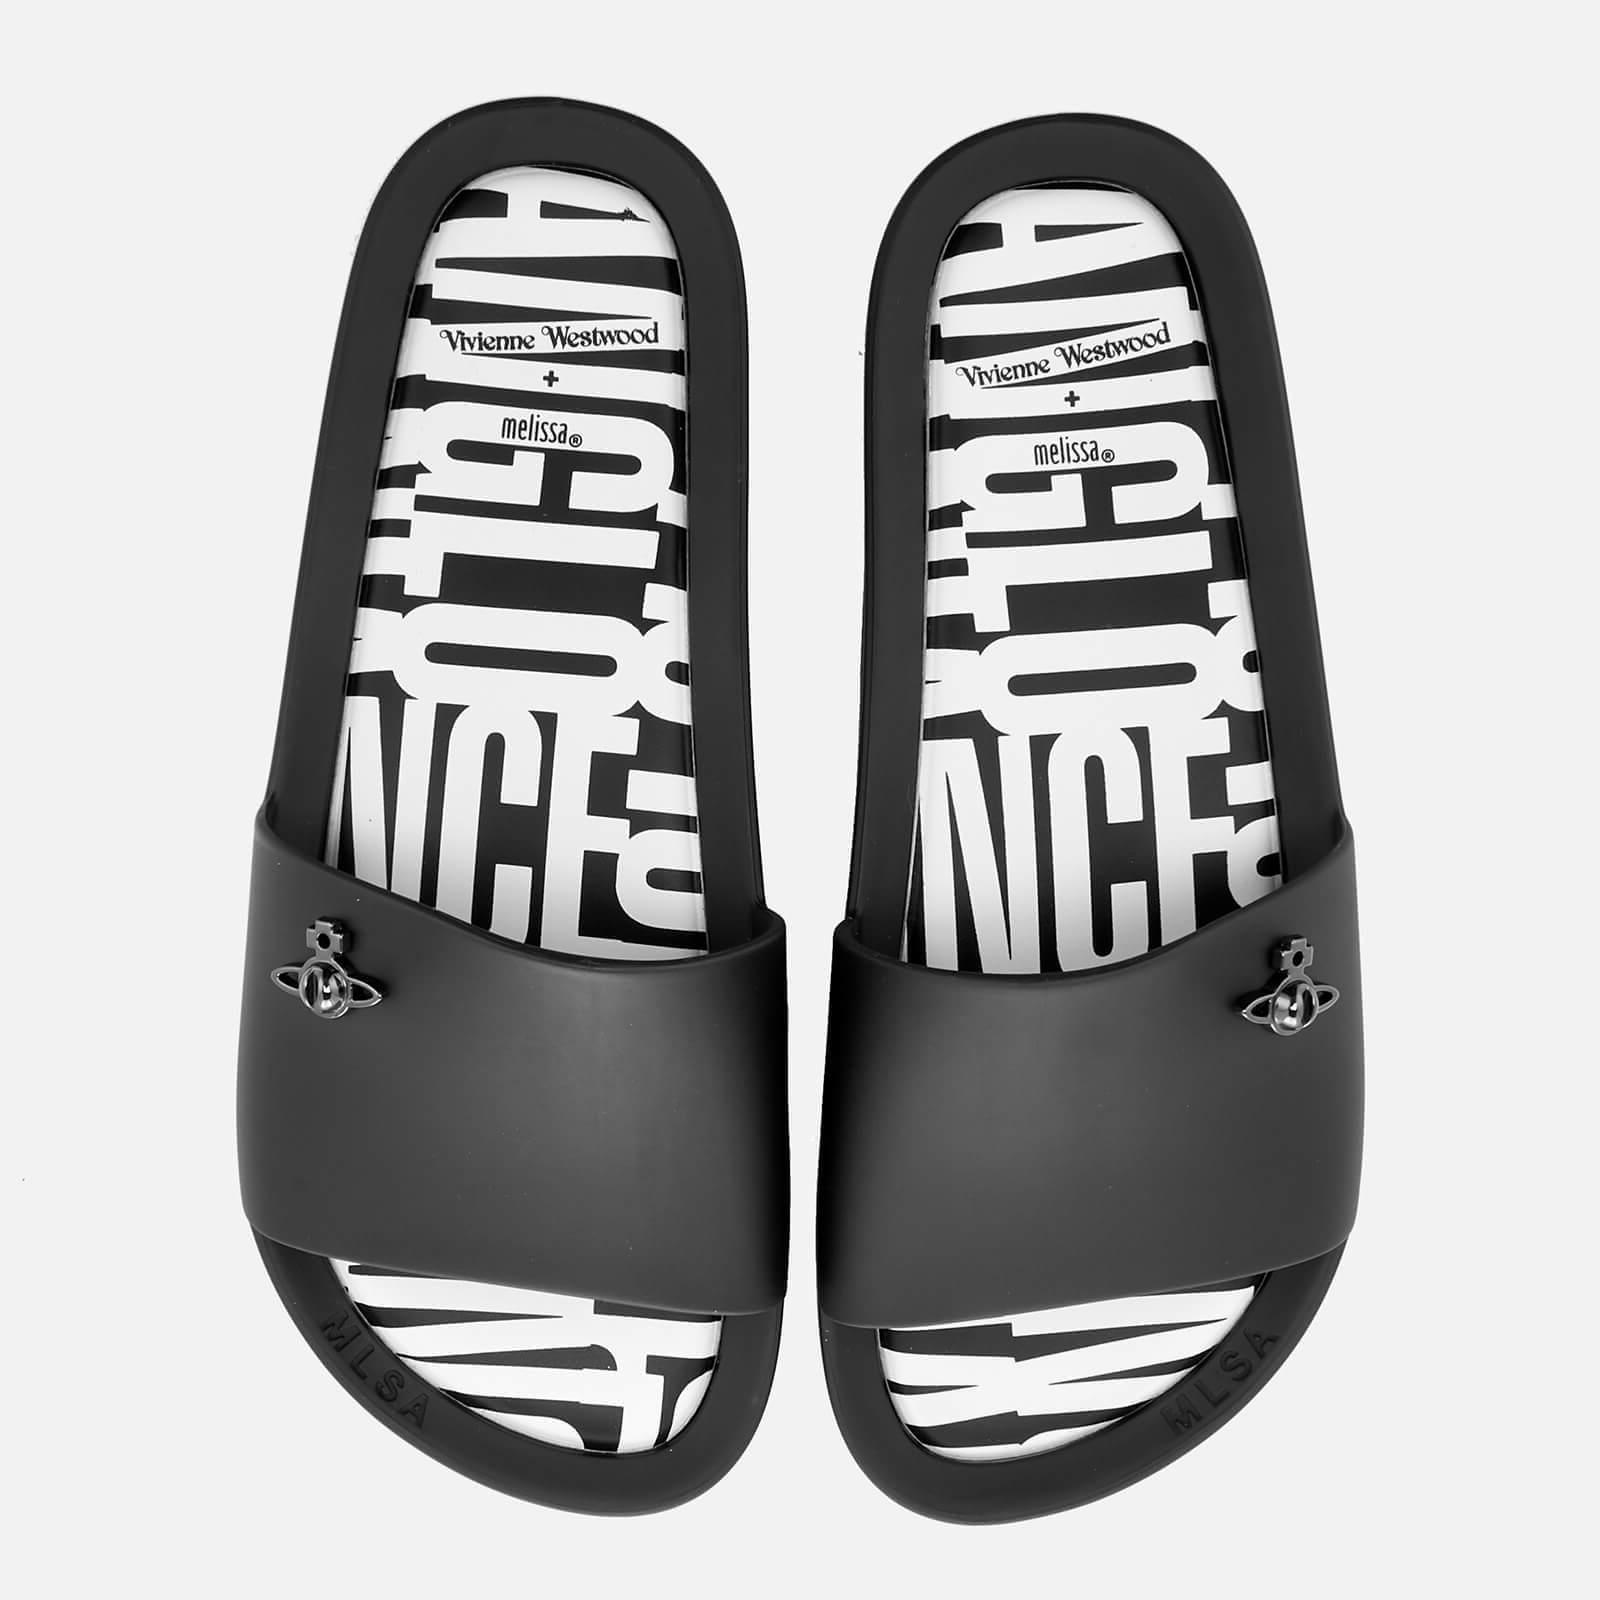 Vivienne Westwood for Melissa Women's Beach Slide 20 Sandals - Black Orb - UK 5